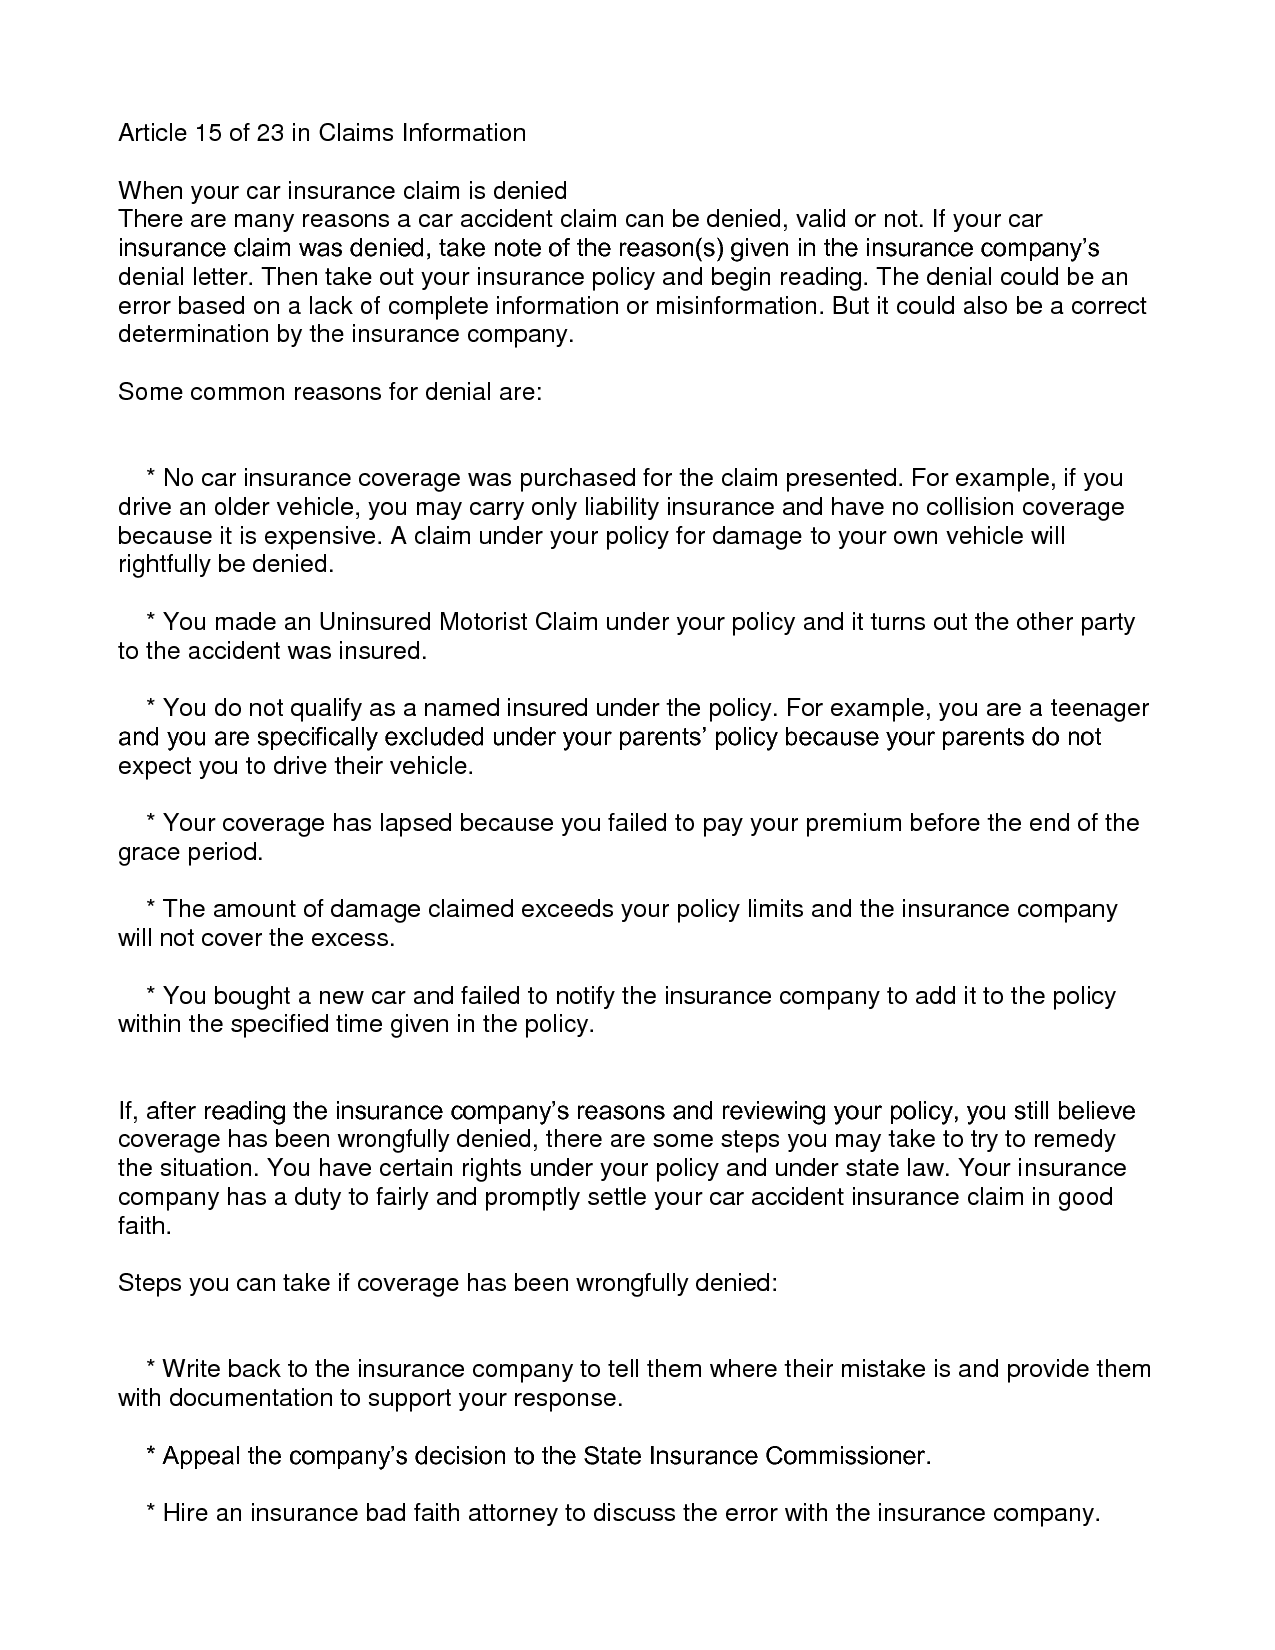 Insurance Claim Denial Letter - Free Printable Documents